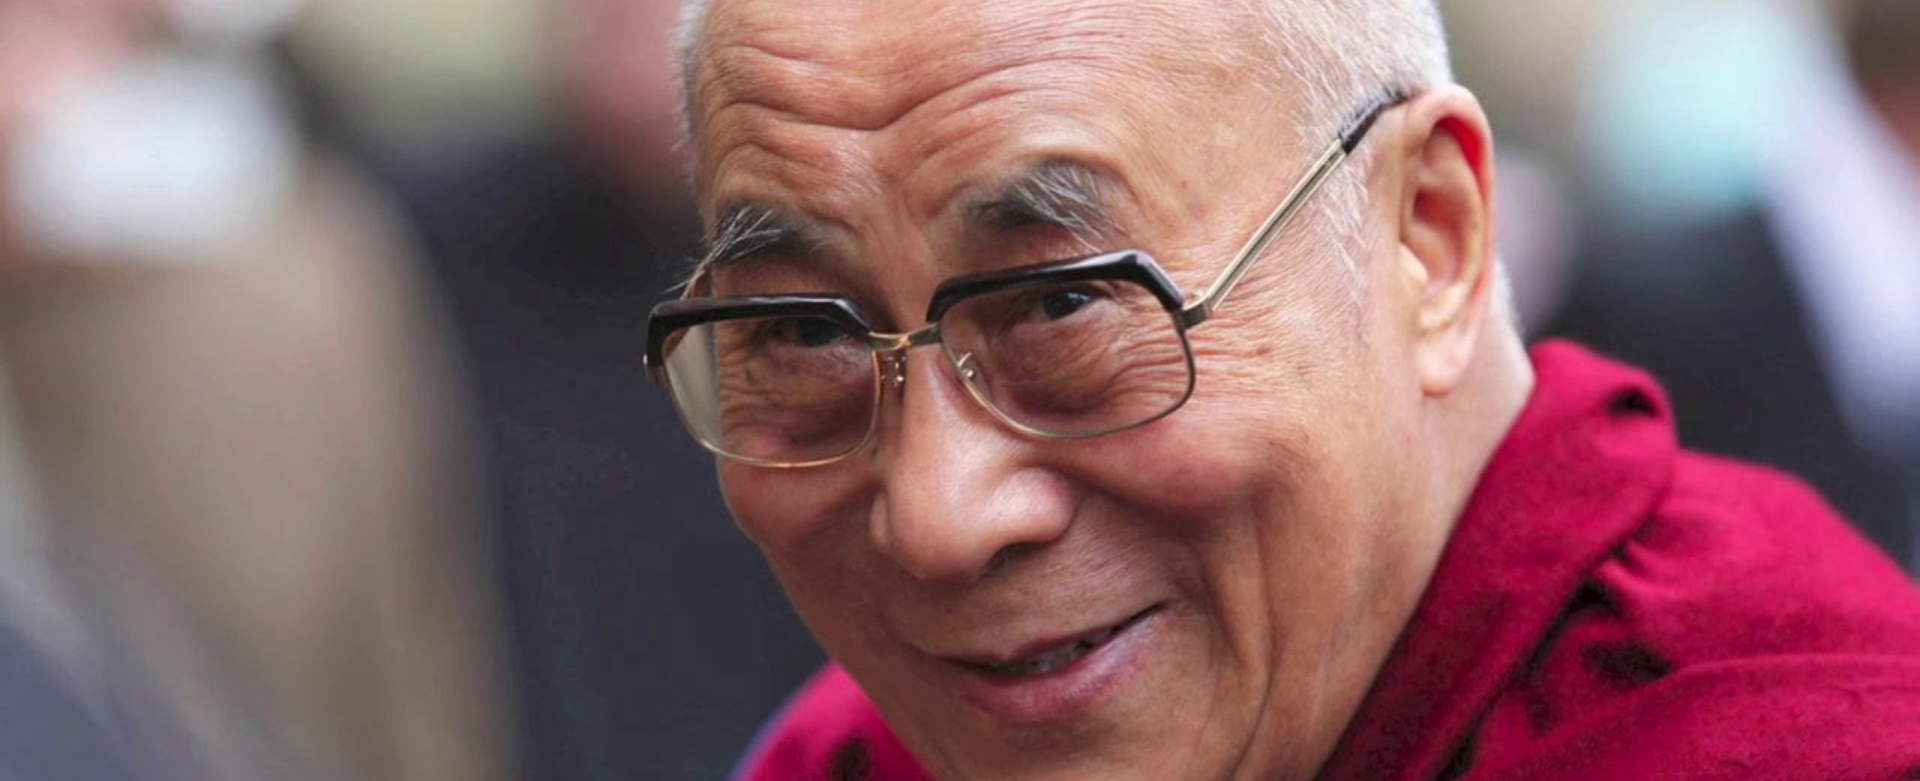 Dalai Lama a Firenze